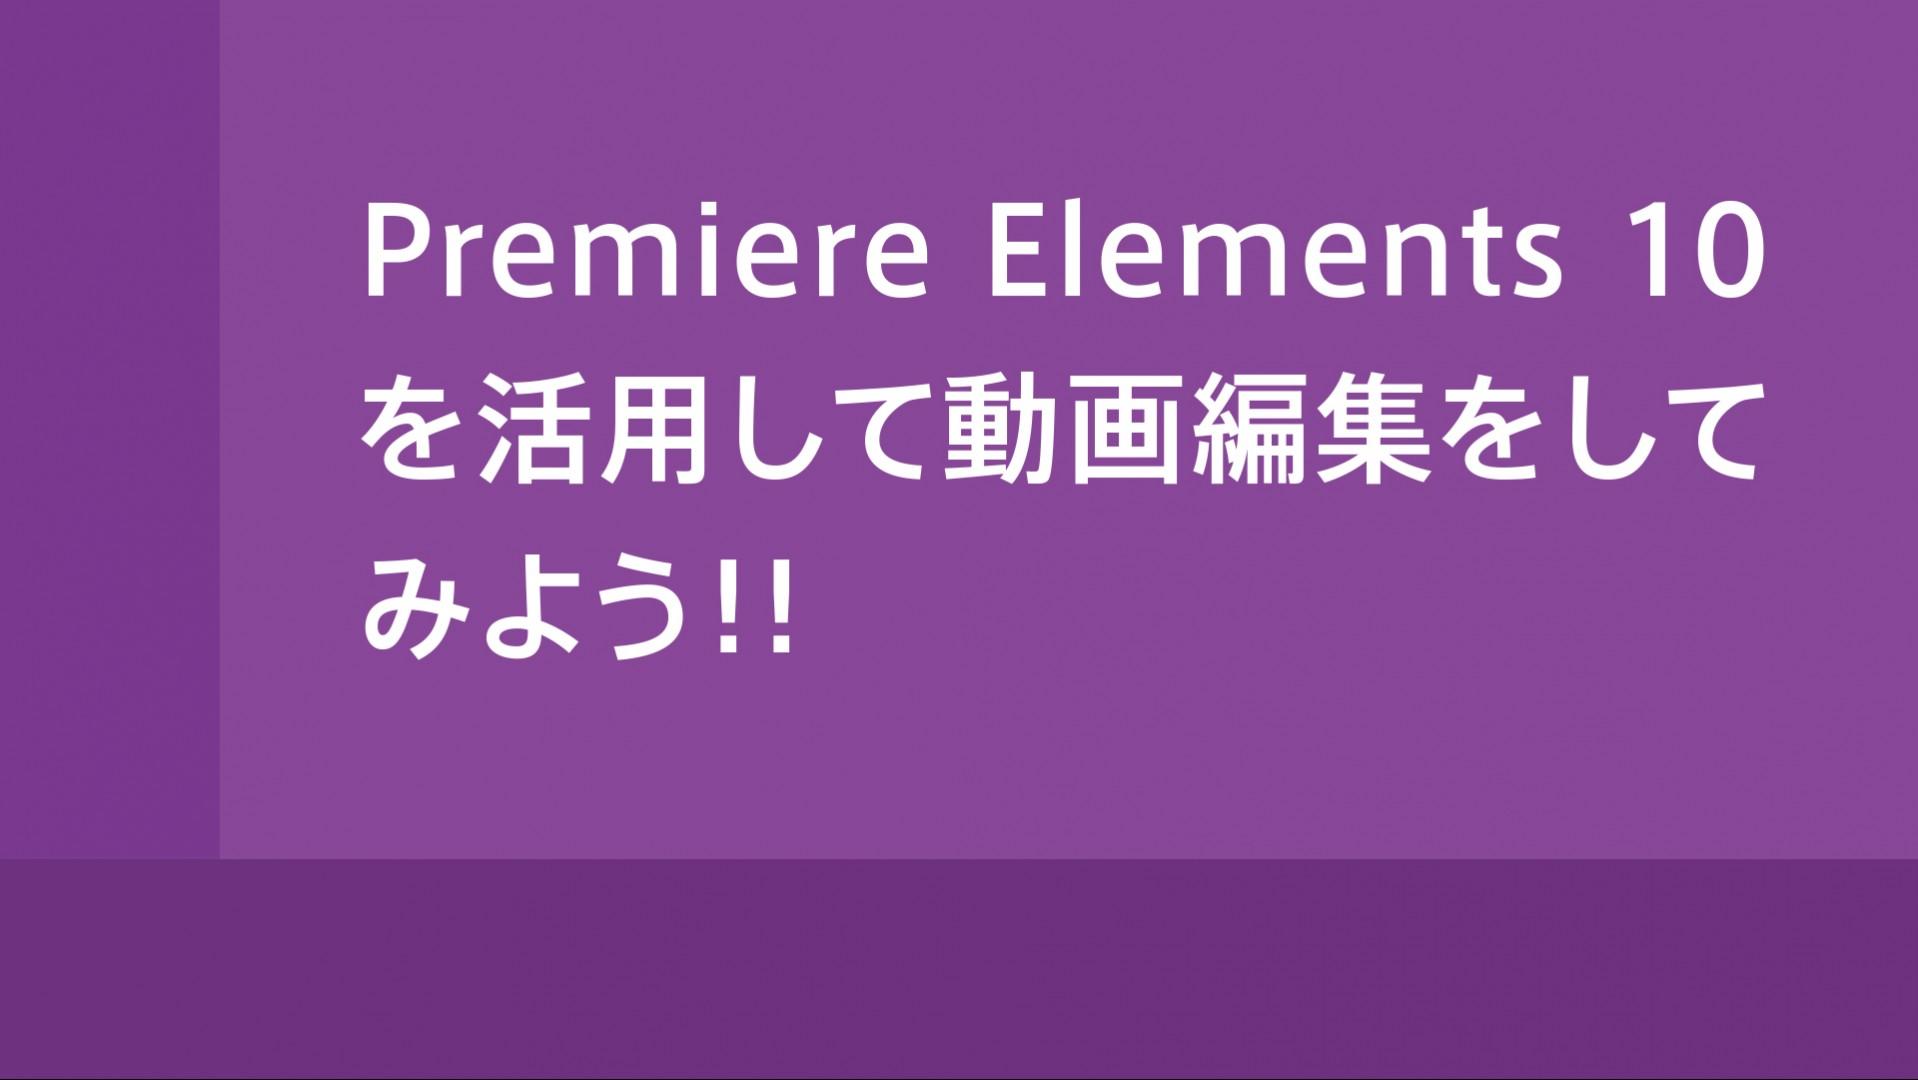 Premiere Elements 10 タイムライン表示に切り替える